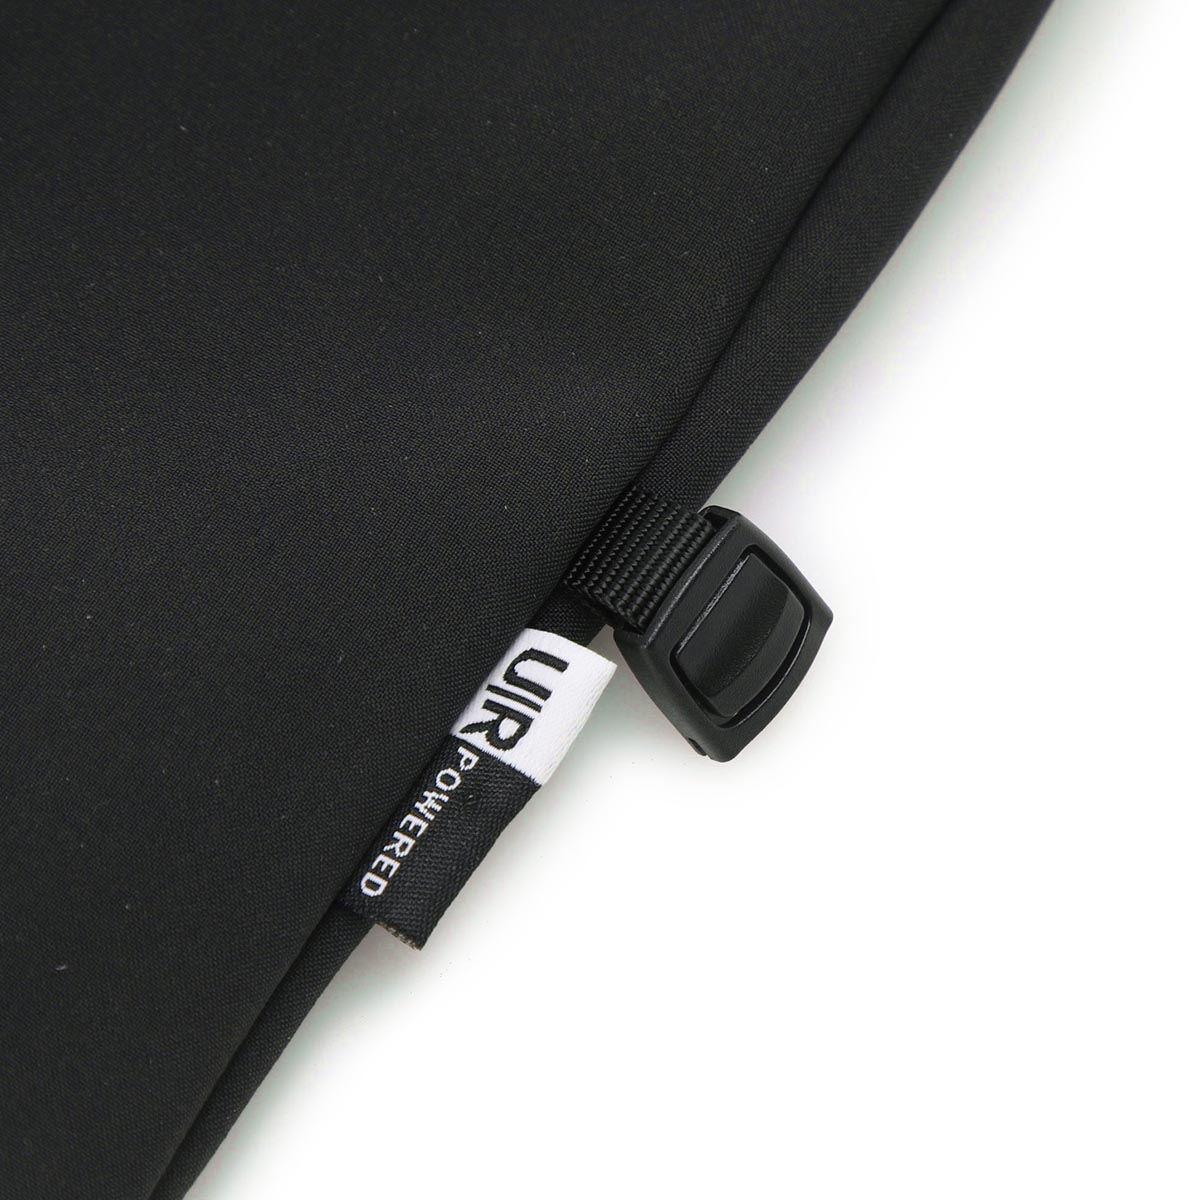 THE NORTH FACE ノースフェイス 手袋/グローブ/MEN'S APEX ETIP GLOVES メンズ